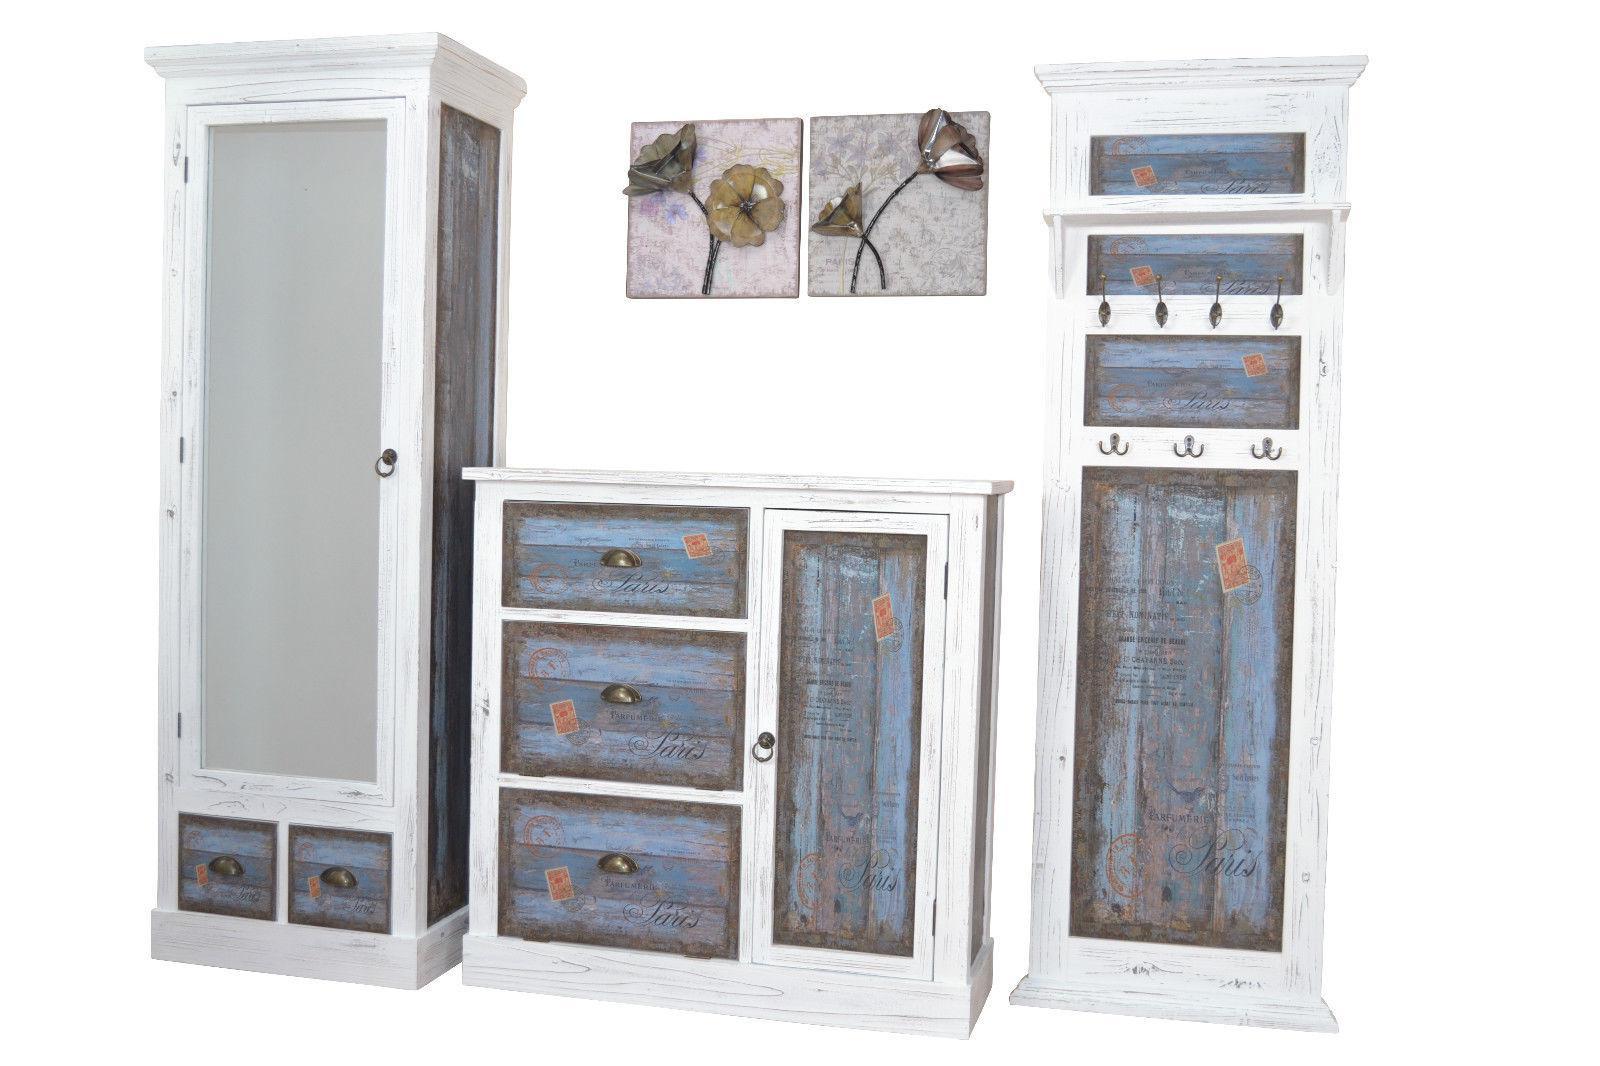 schuhschrank massivholz tanne vintage used look wei blau. Black Bedroom Furniture Sets. Home Design Ideas